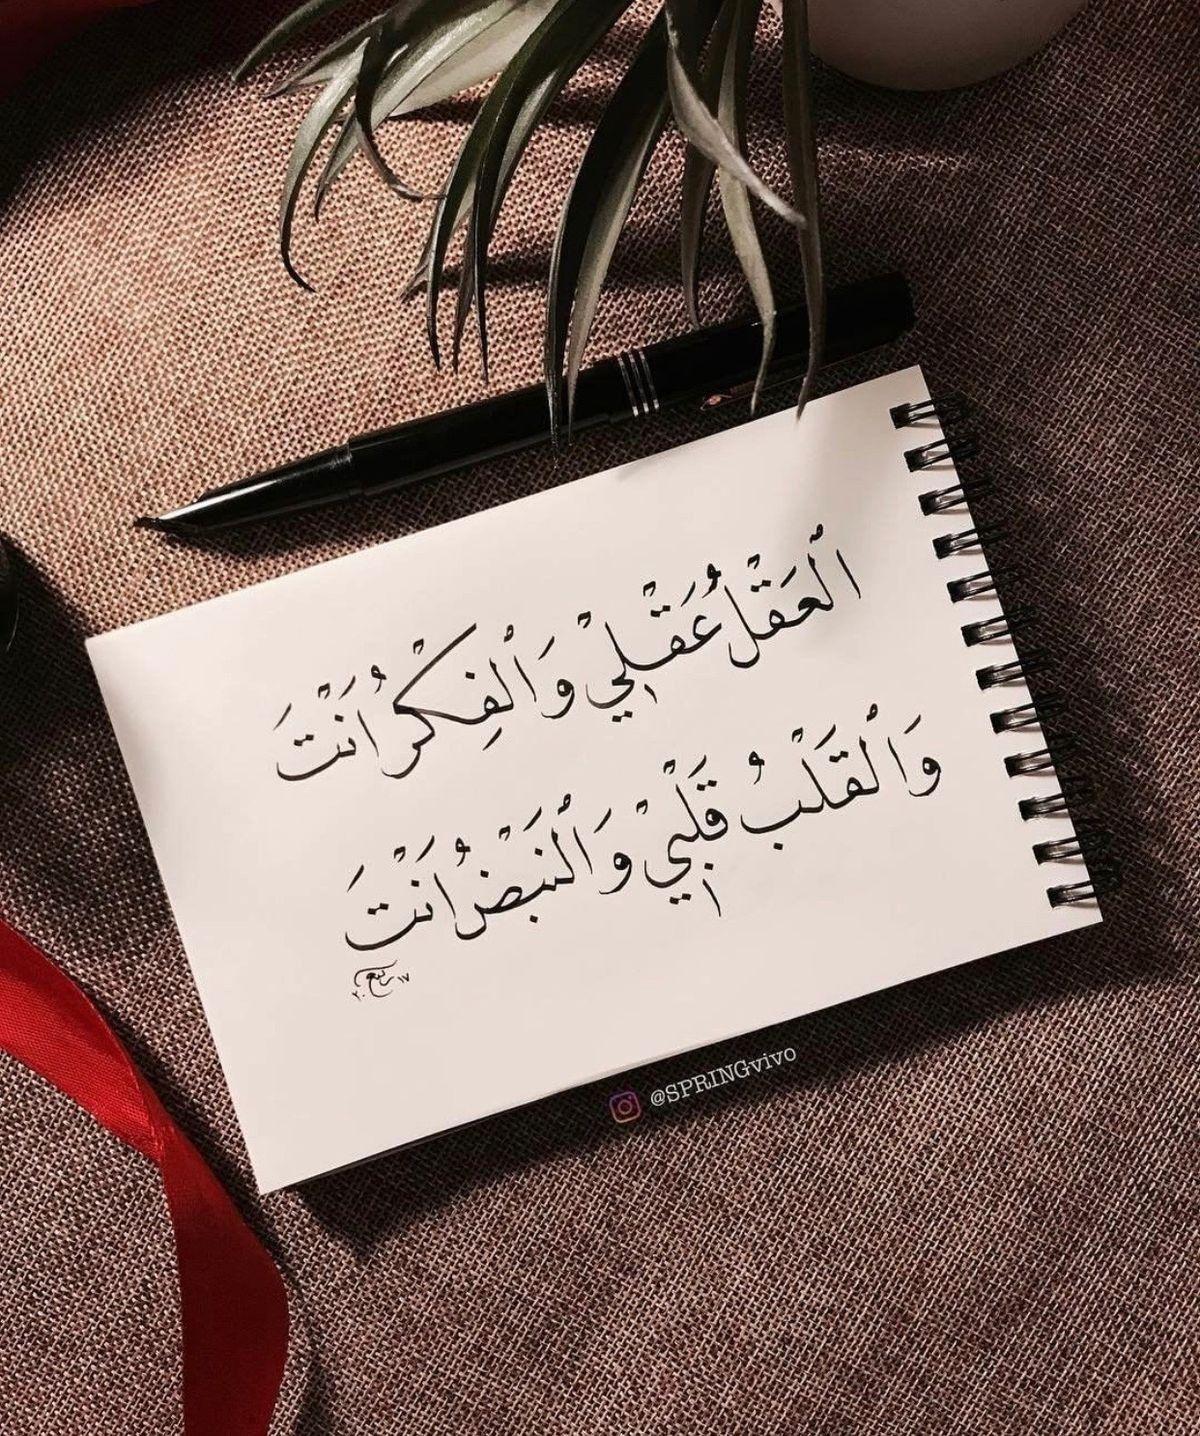 والقلب قلبي والنبض انت Calligraphy Quotes Love Funny Arabic Quotes Calligraphy Quotes